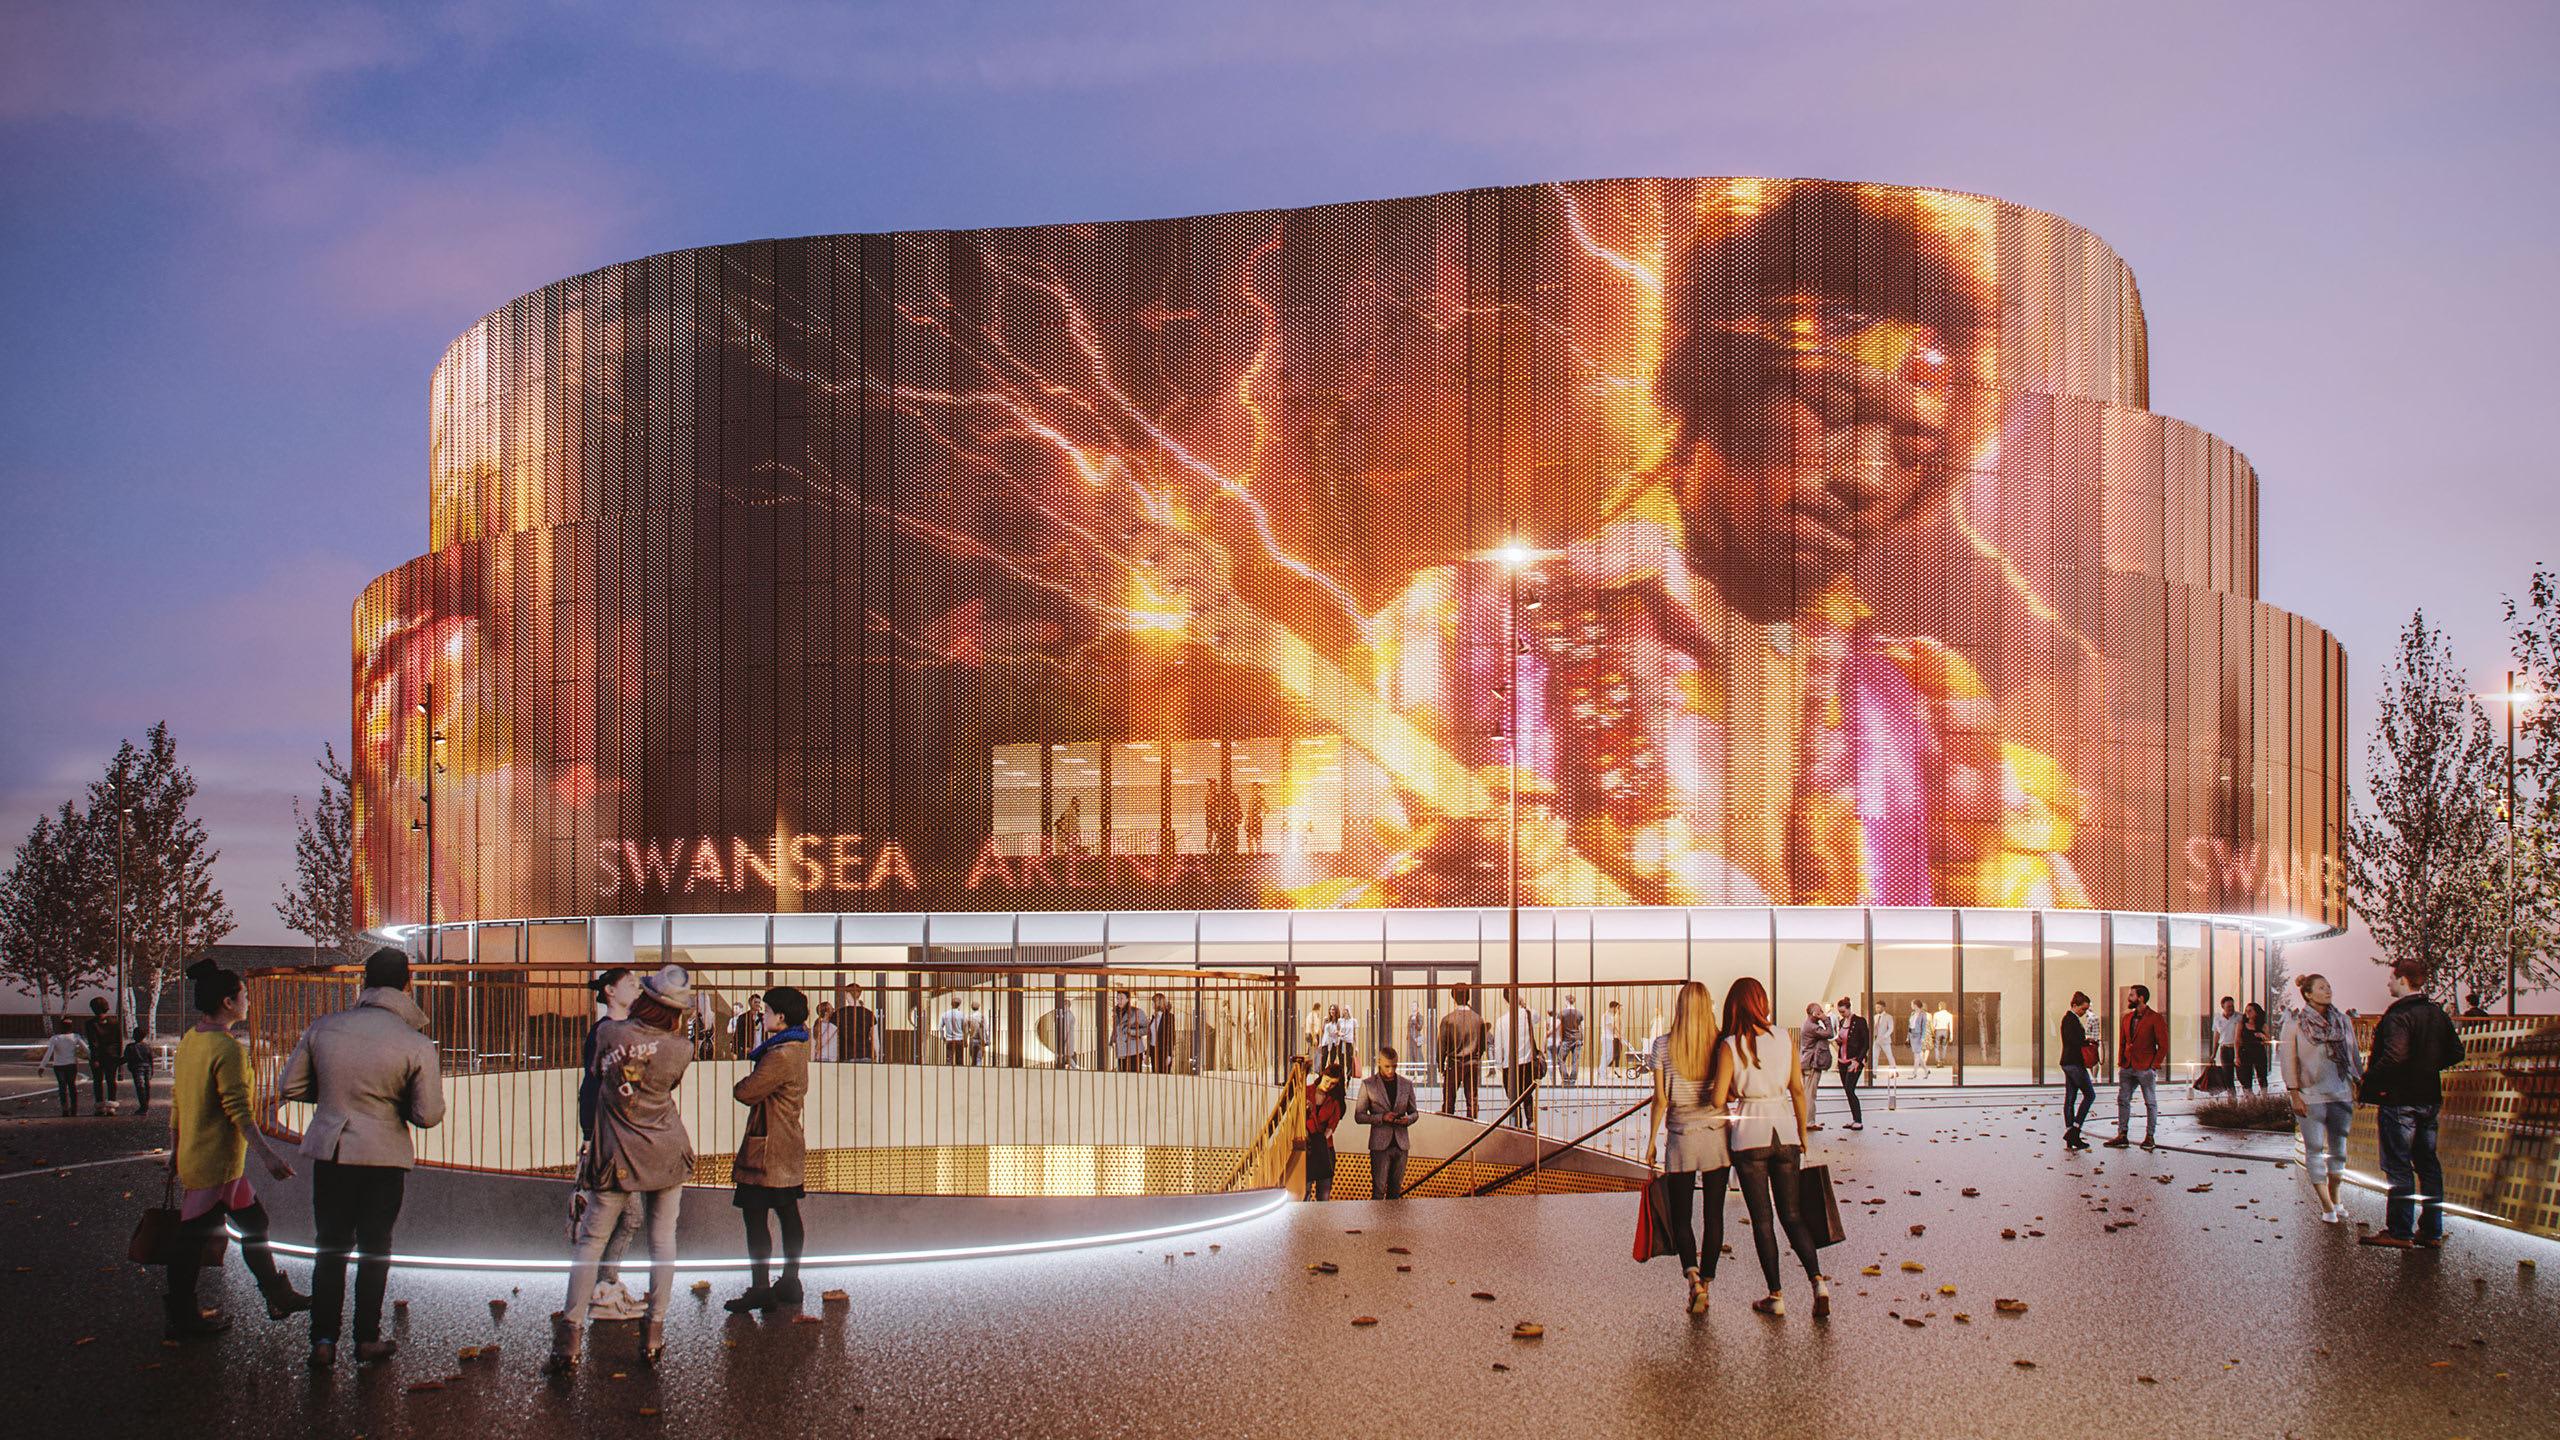 Swansea Arena External